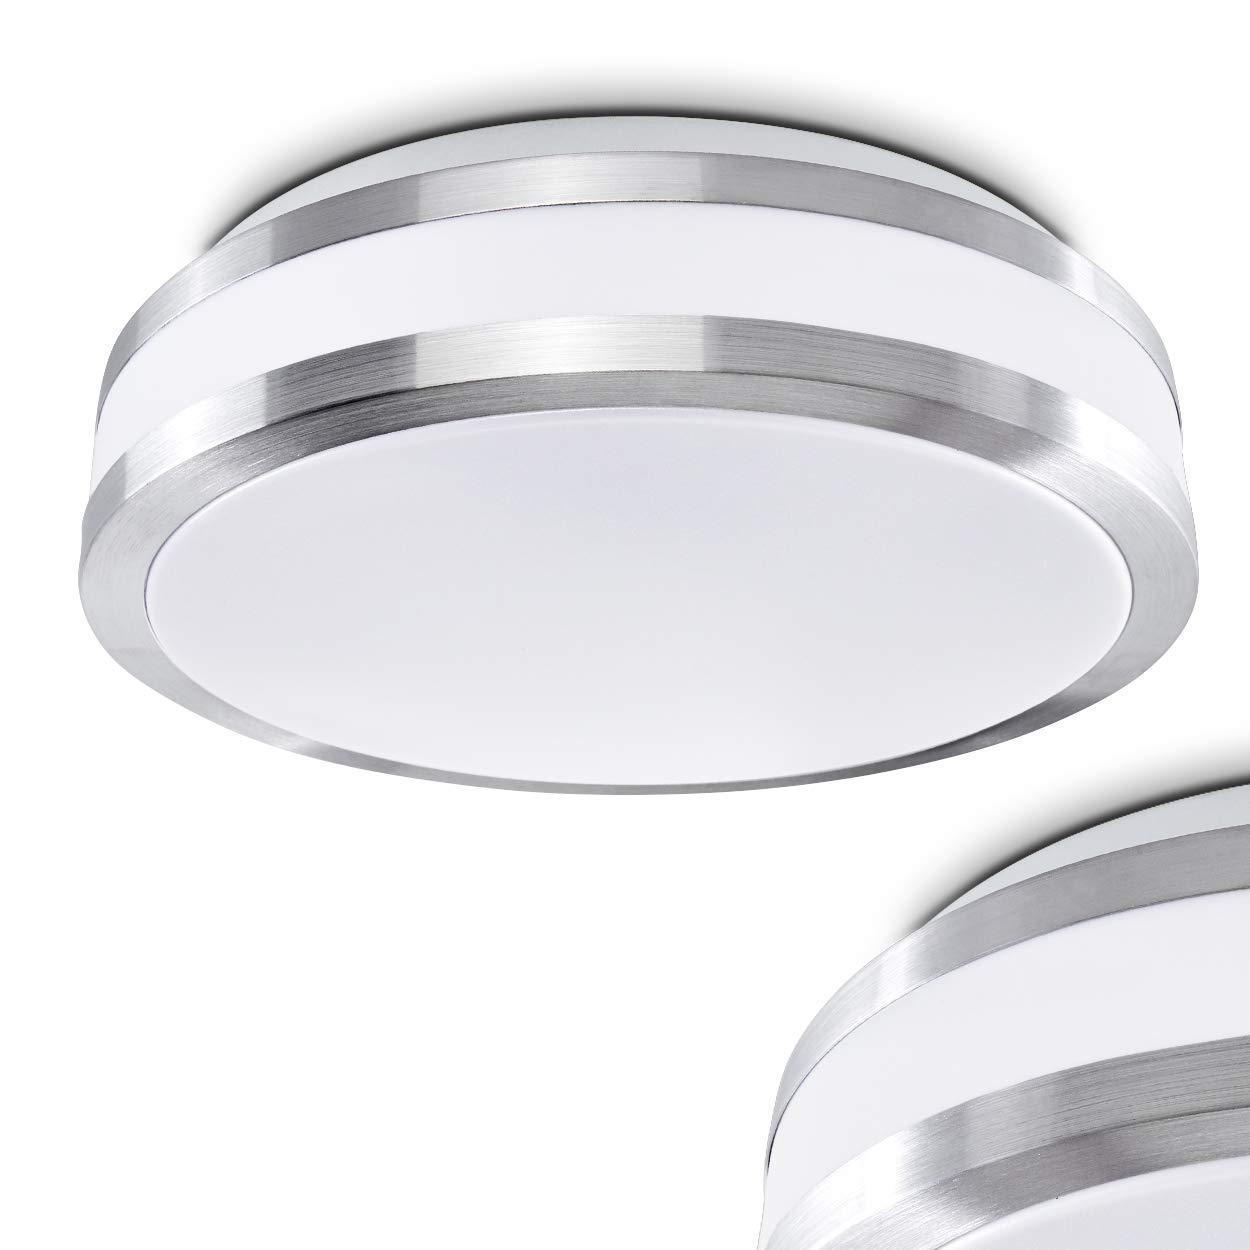 LED Plafoniera Design Moderno Forma Rotonda Sora 12 Watt [Classe di efficienza energetica A] Hofstein H166056